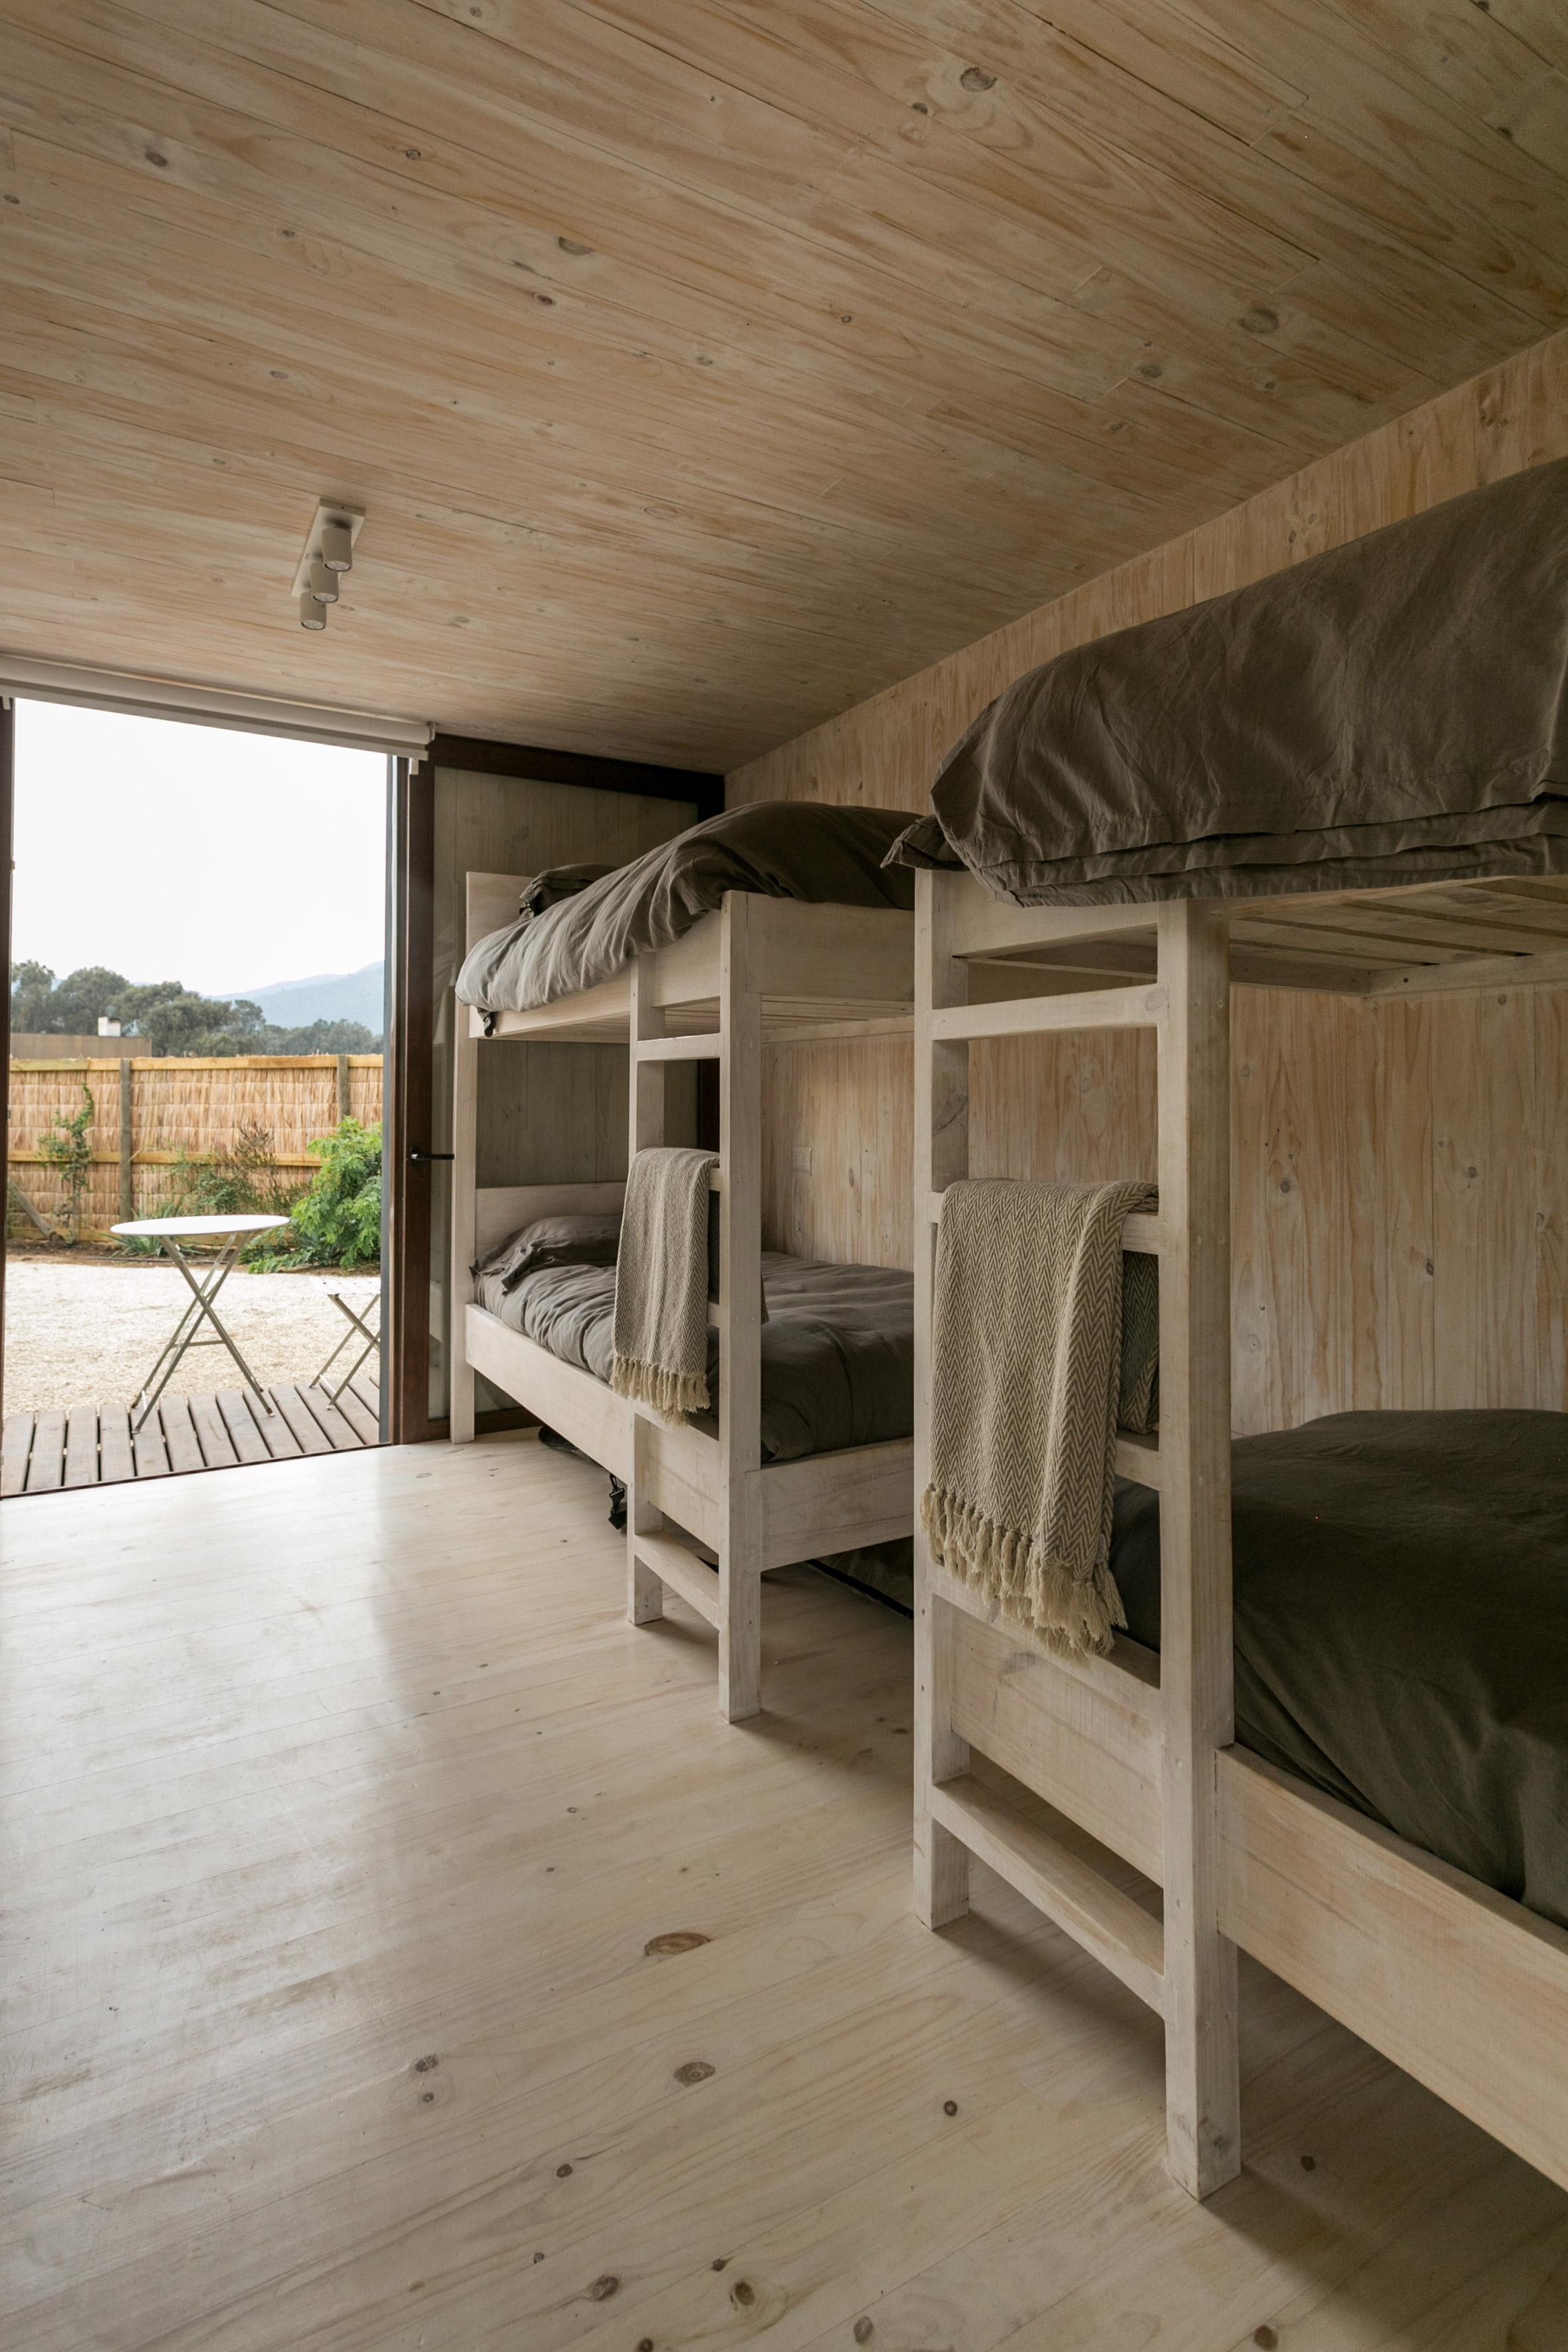 shotgun-house-alejandro-soffia-architecture-black-wood-chile_dezeen_2364_col_8.jpg